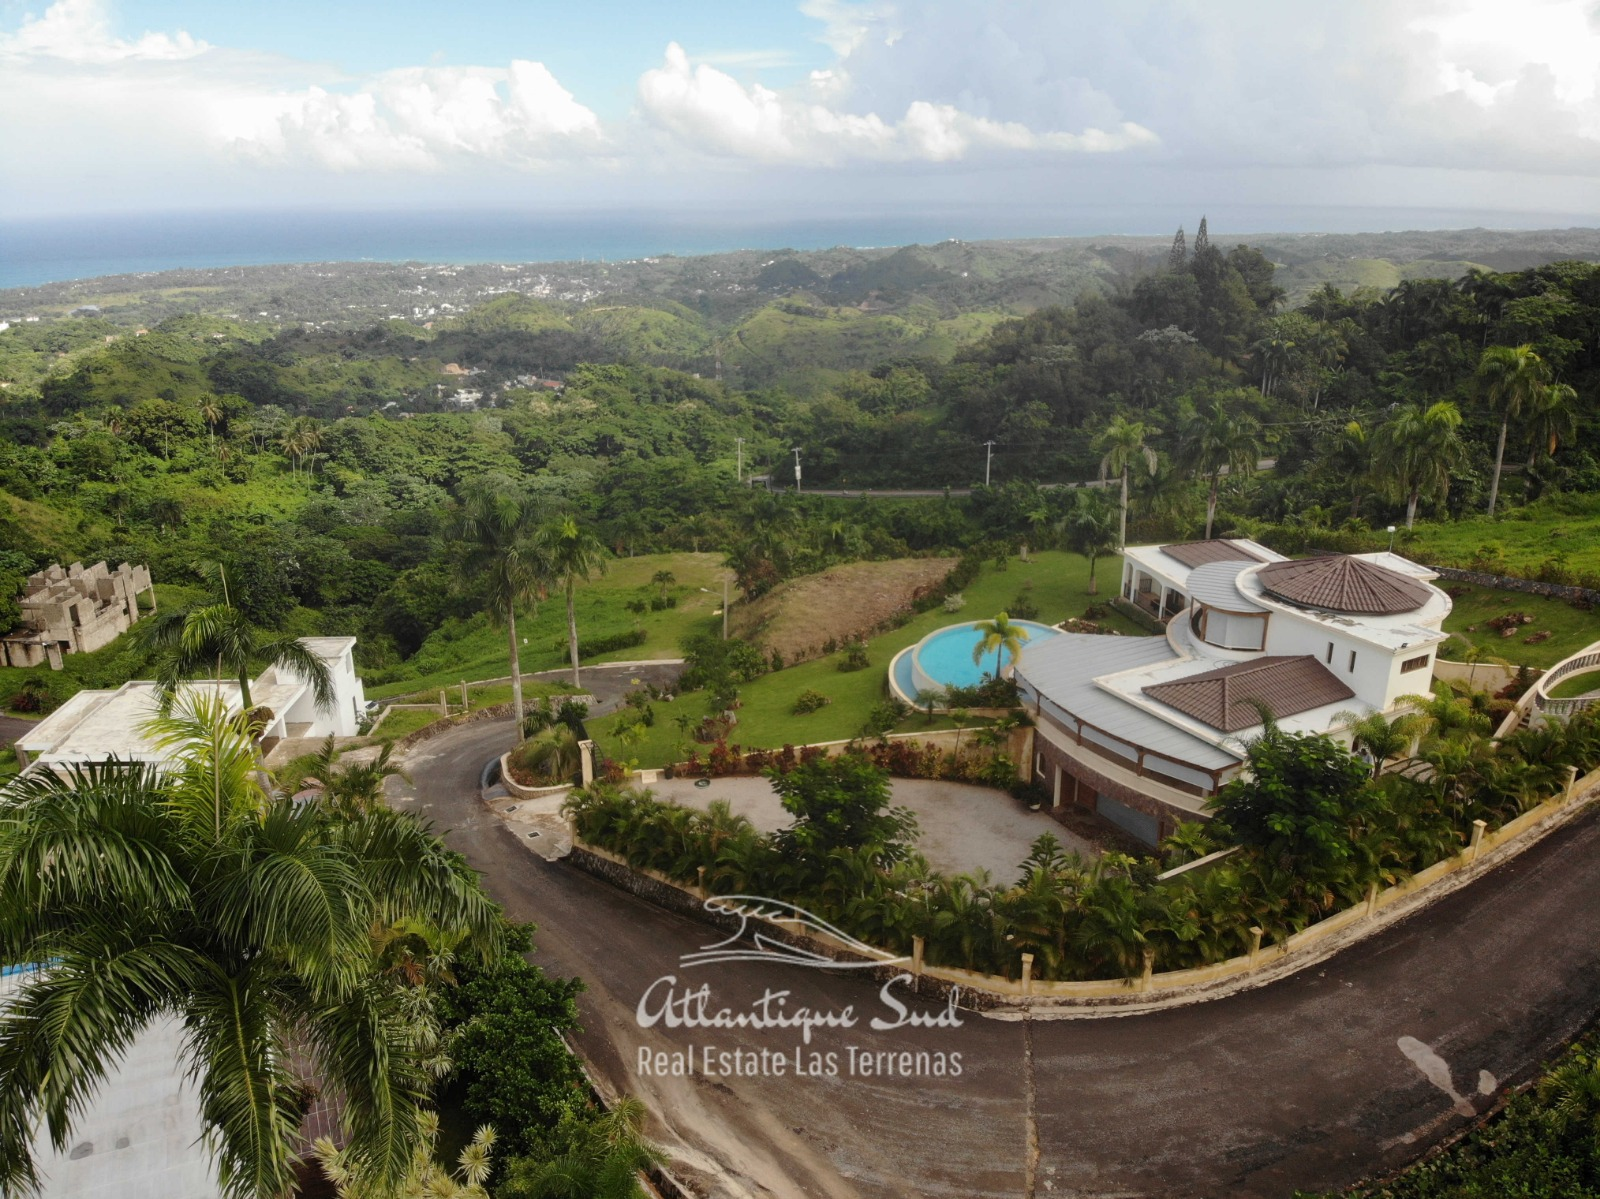 Hillside Lots for sale in Las Terrenas24.jpeg